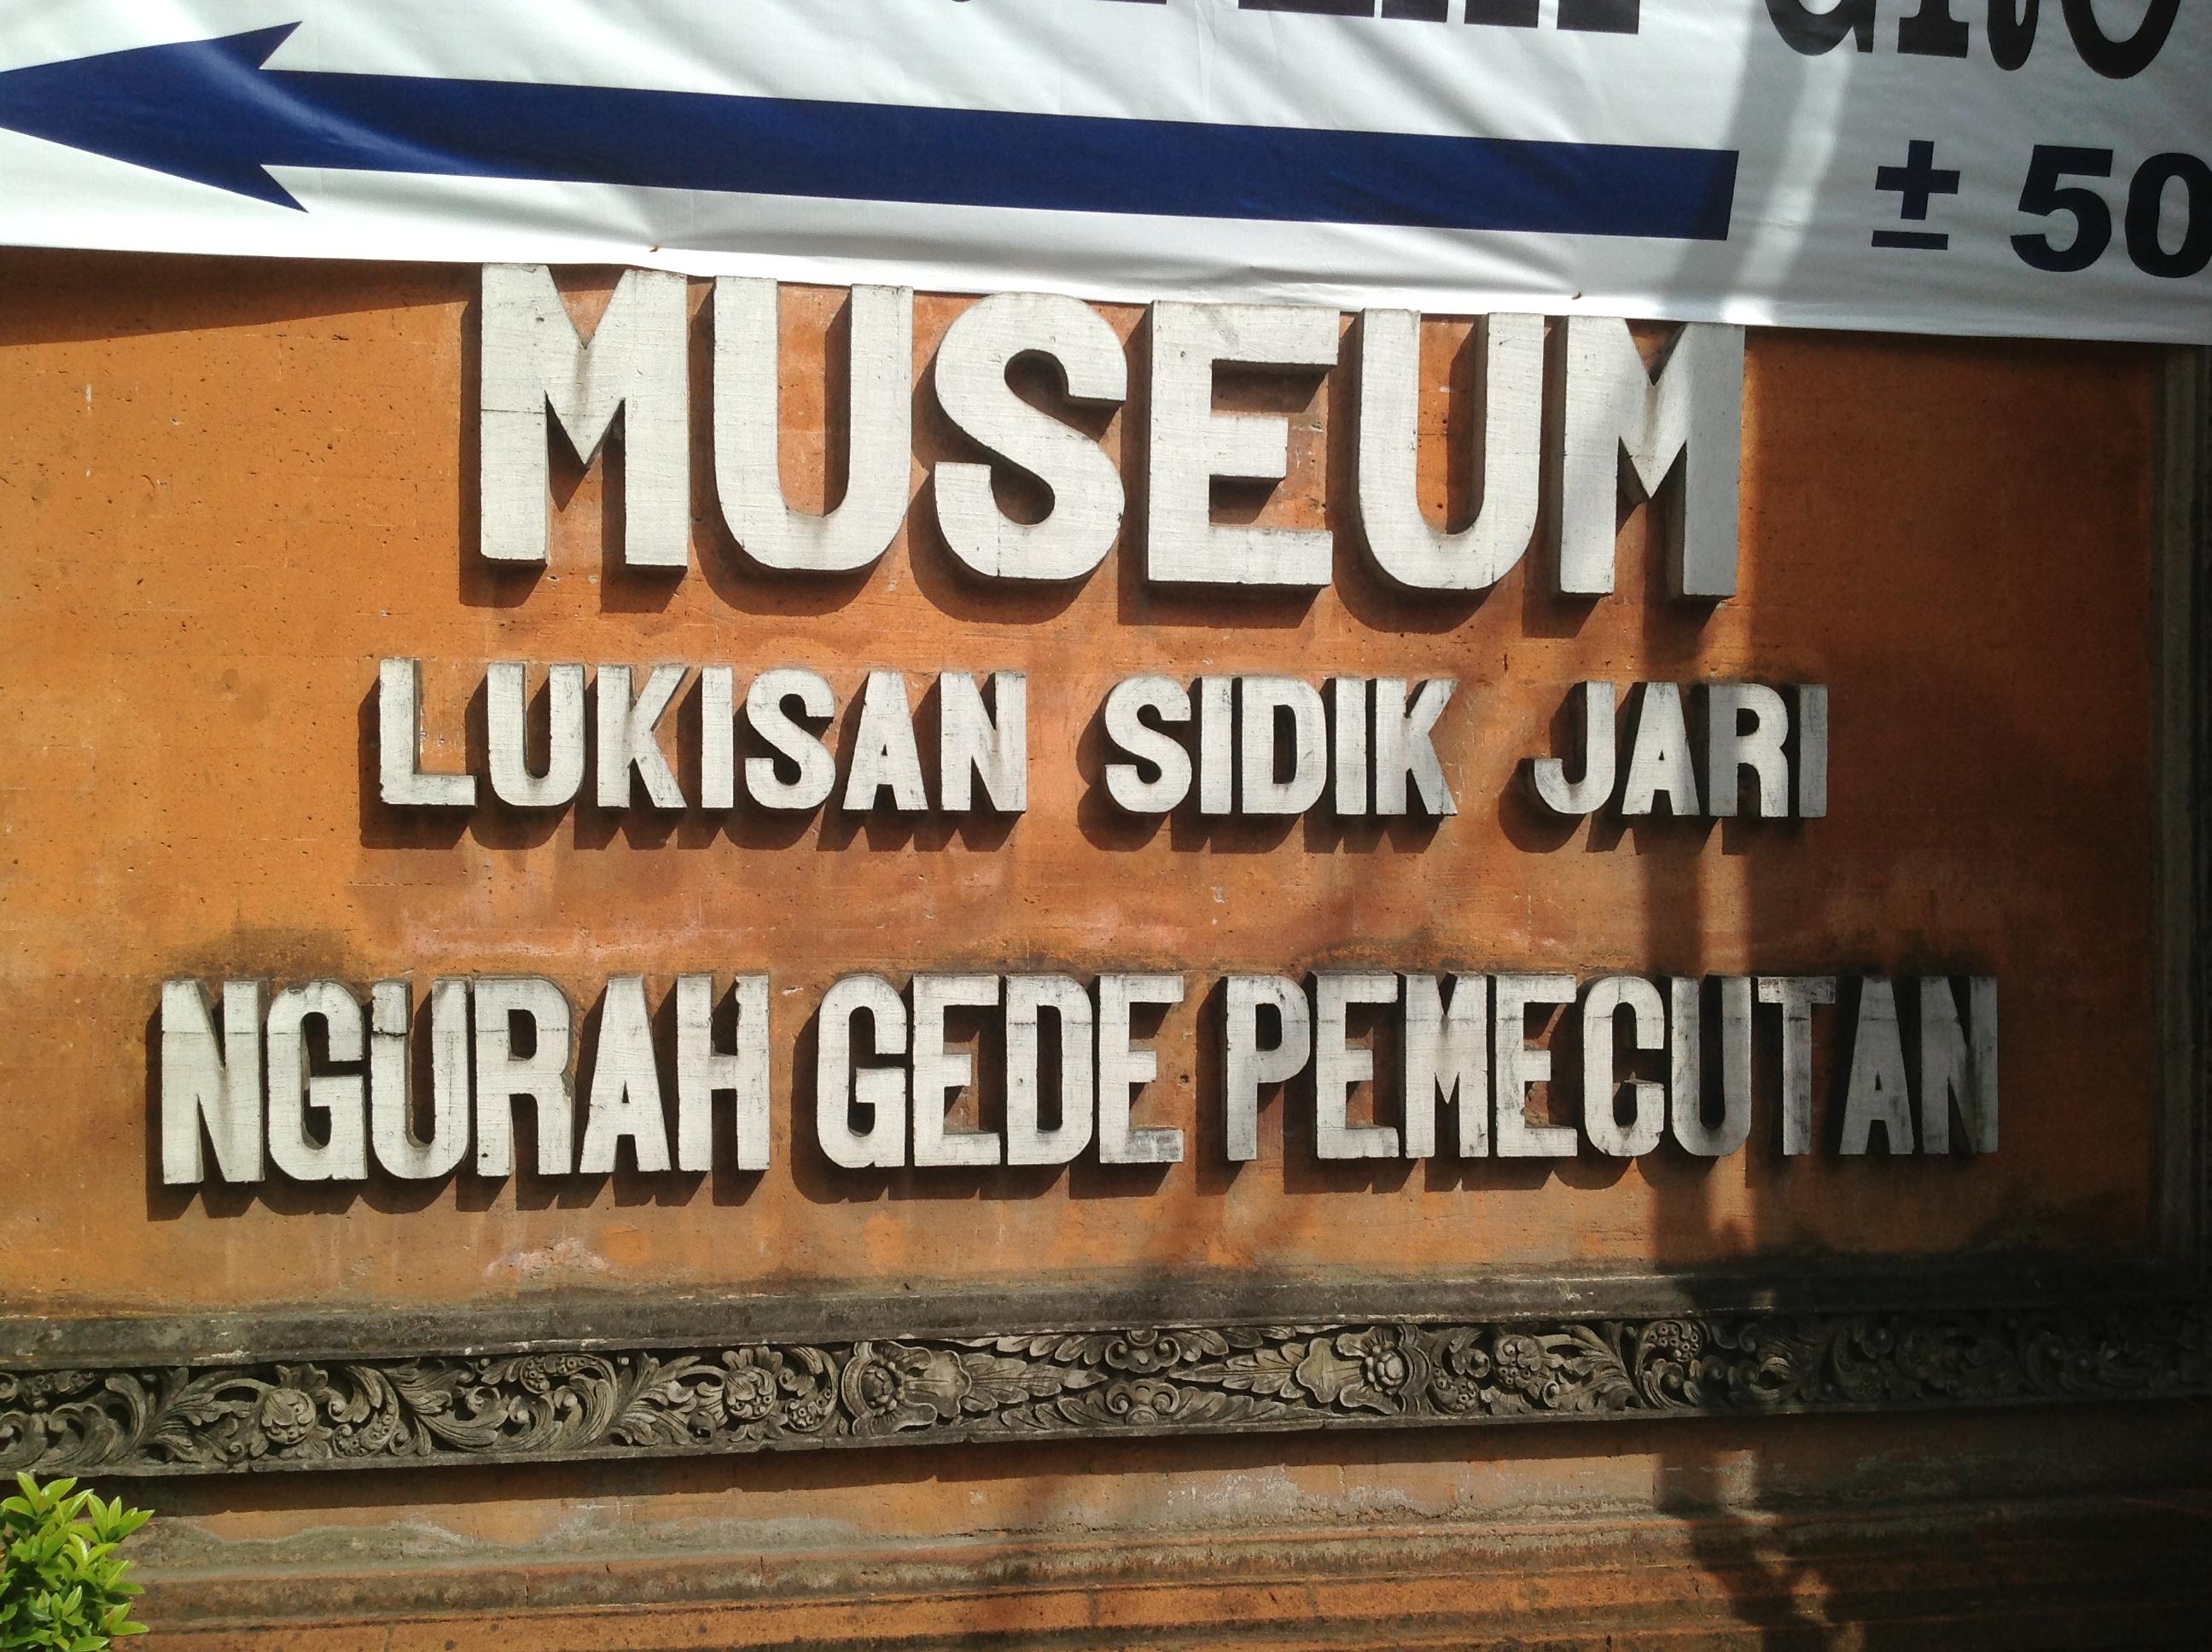 Bali Culture Art Place Museum Lukisan Sidik Jari Image Waktu